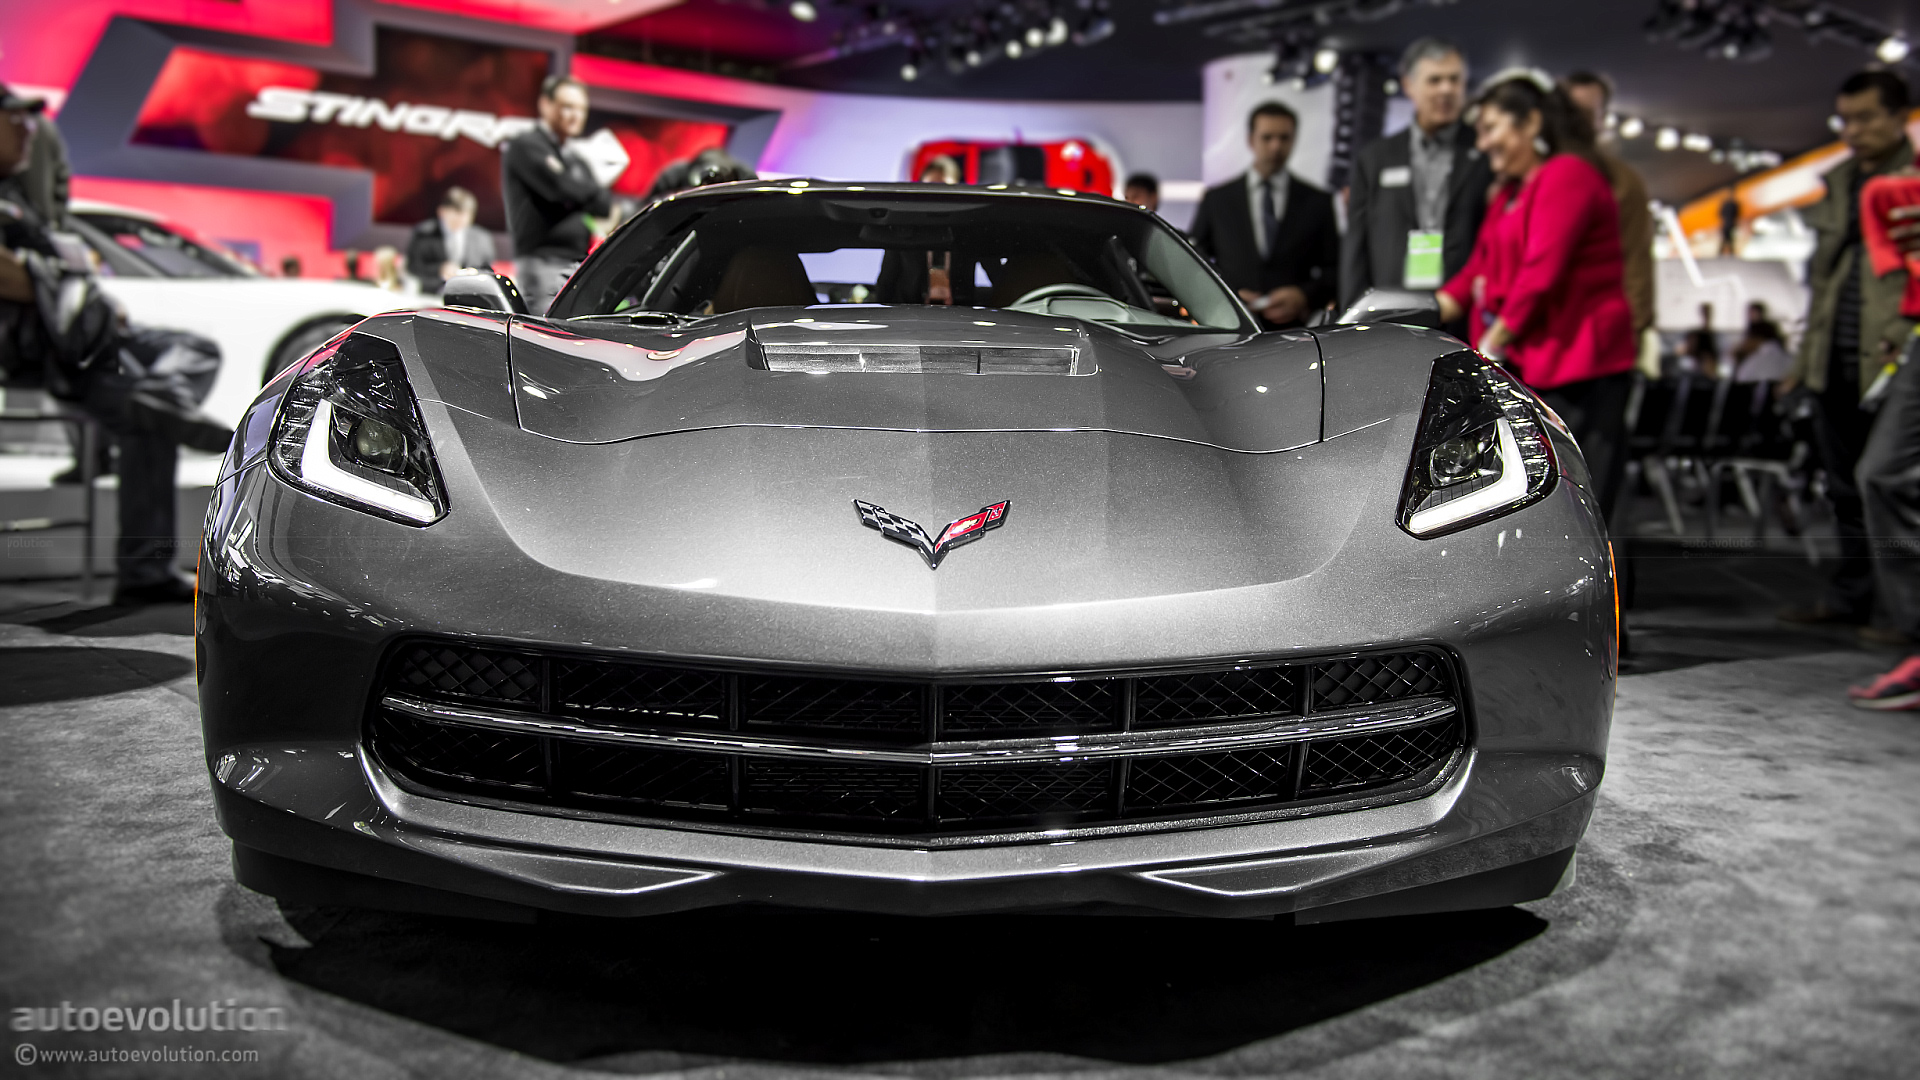 2013 naias 2014 chevrolet corvette c7 stingray in detail live photos autoevolution. Black Bedroom Furniture Sets. Home Design Ideas